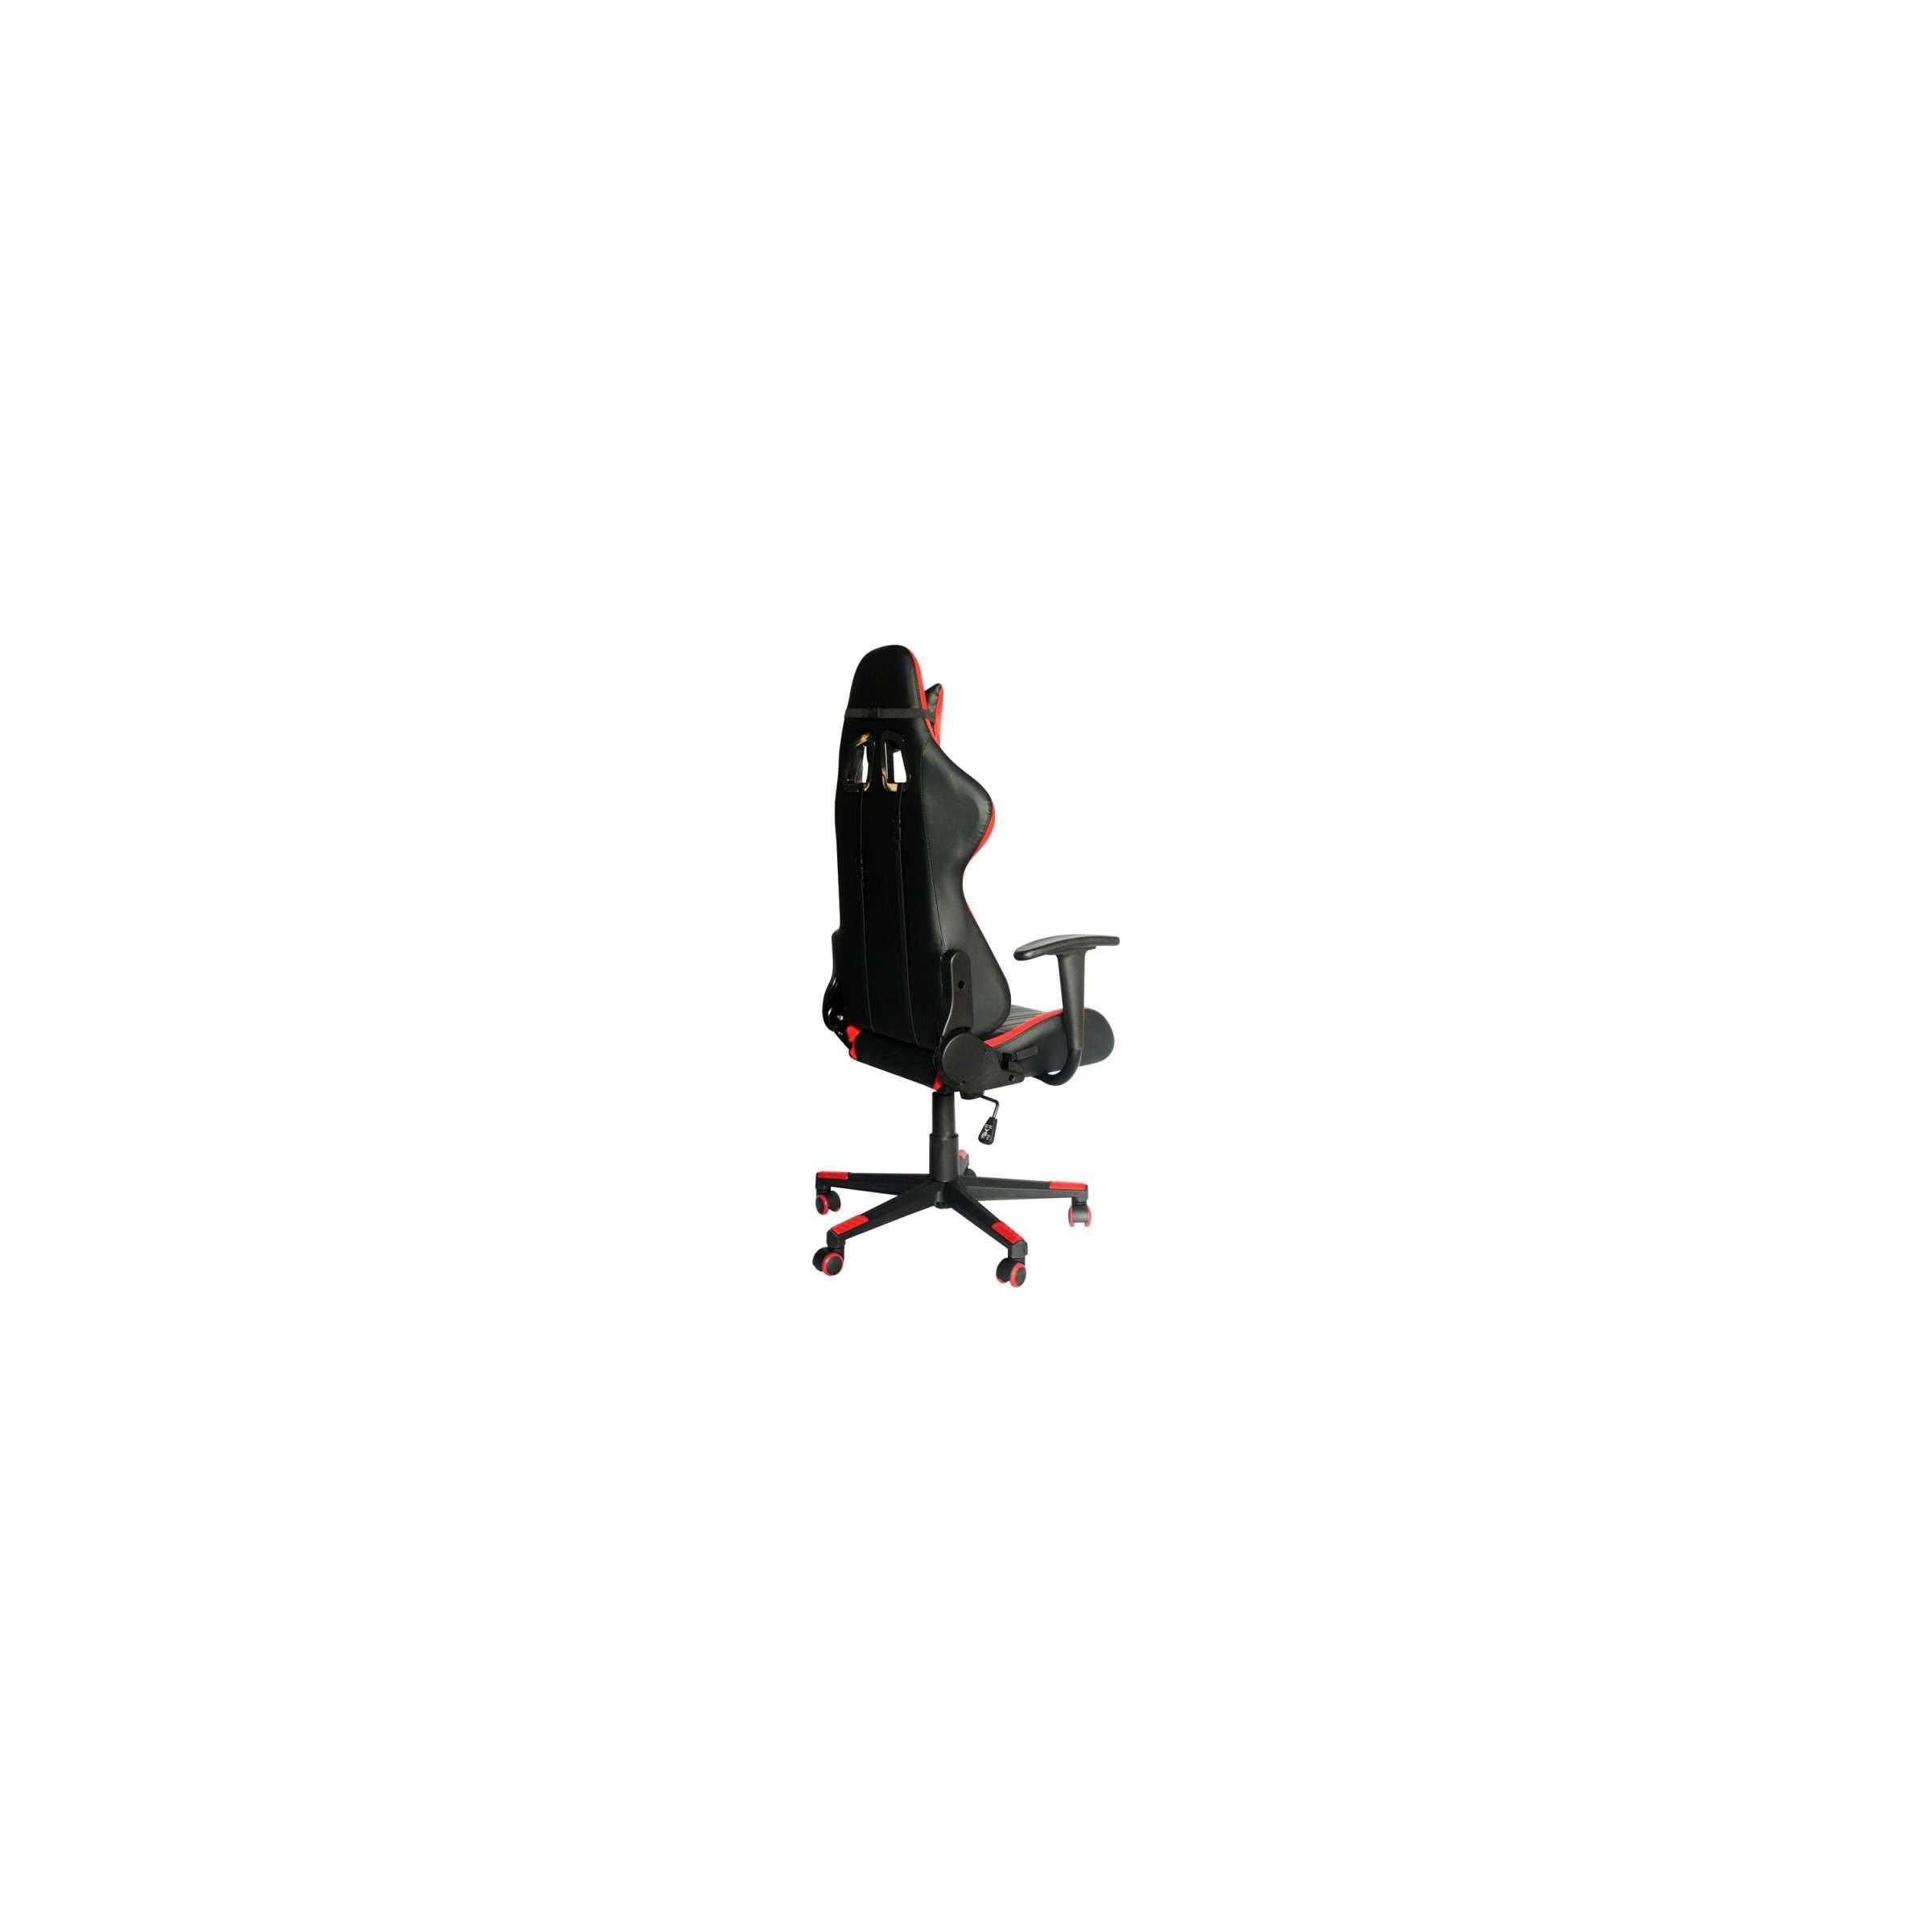 Marvo gaming stol ch109 sort/rød fra scorpion by marvo fra mackabler.dk